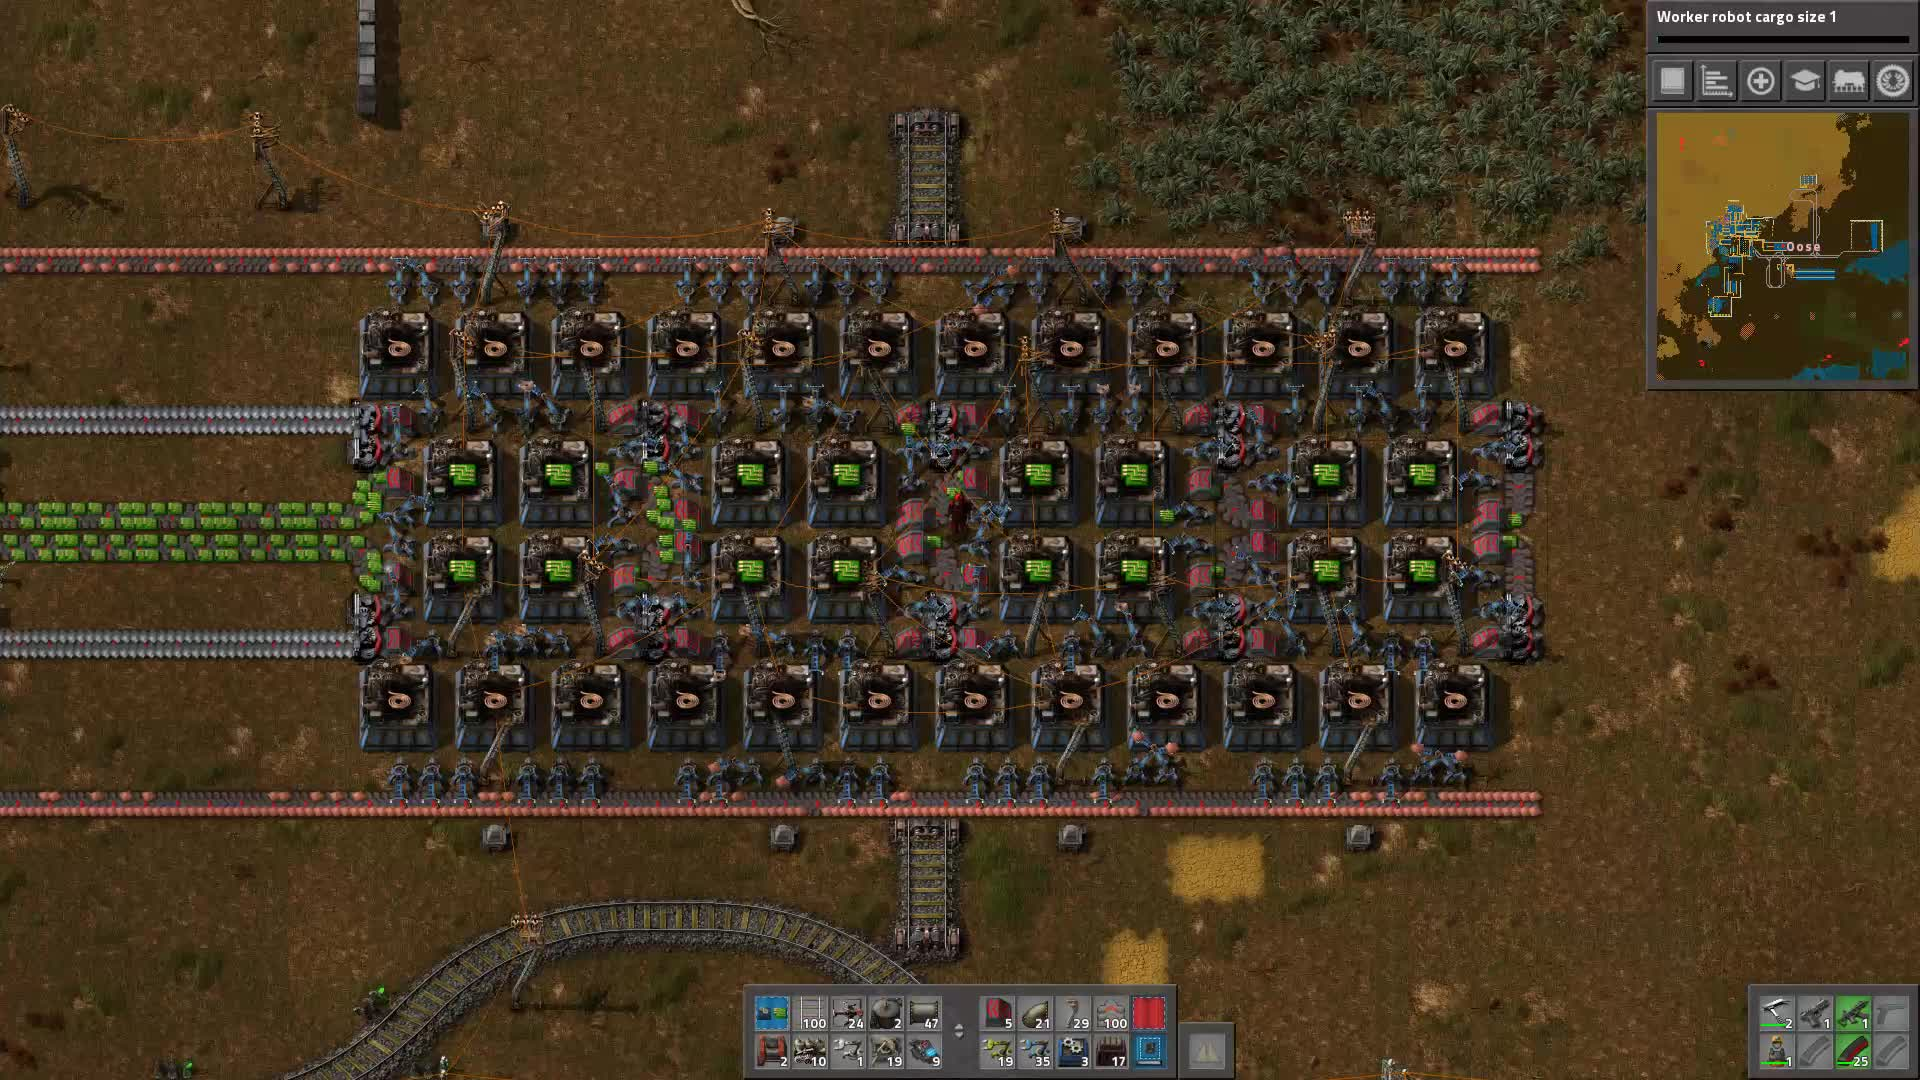 factorio, Very Compact 0.15 Green Circuit Factory (reddit) GIFs